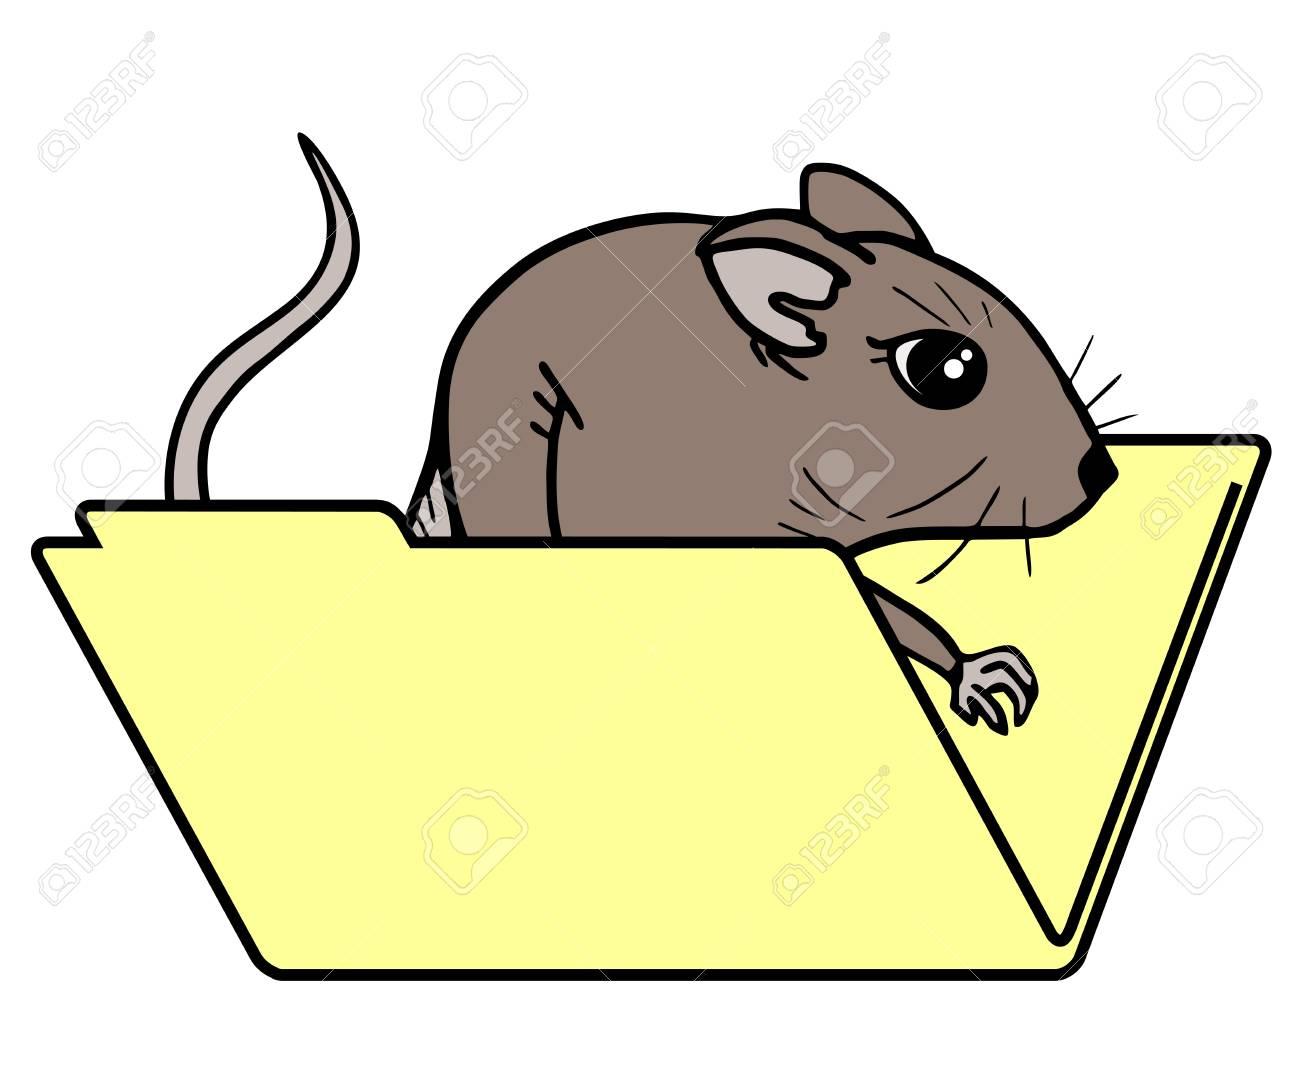 Fuuny mouse folder Stock Vector - 16974326